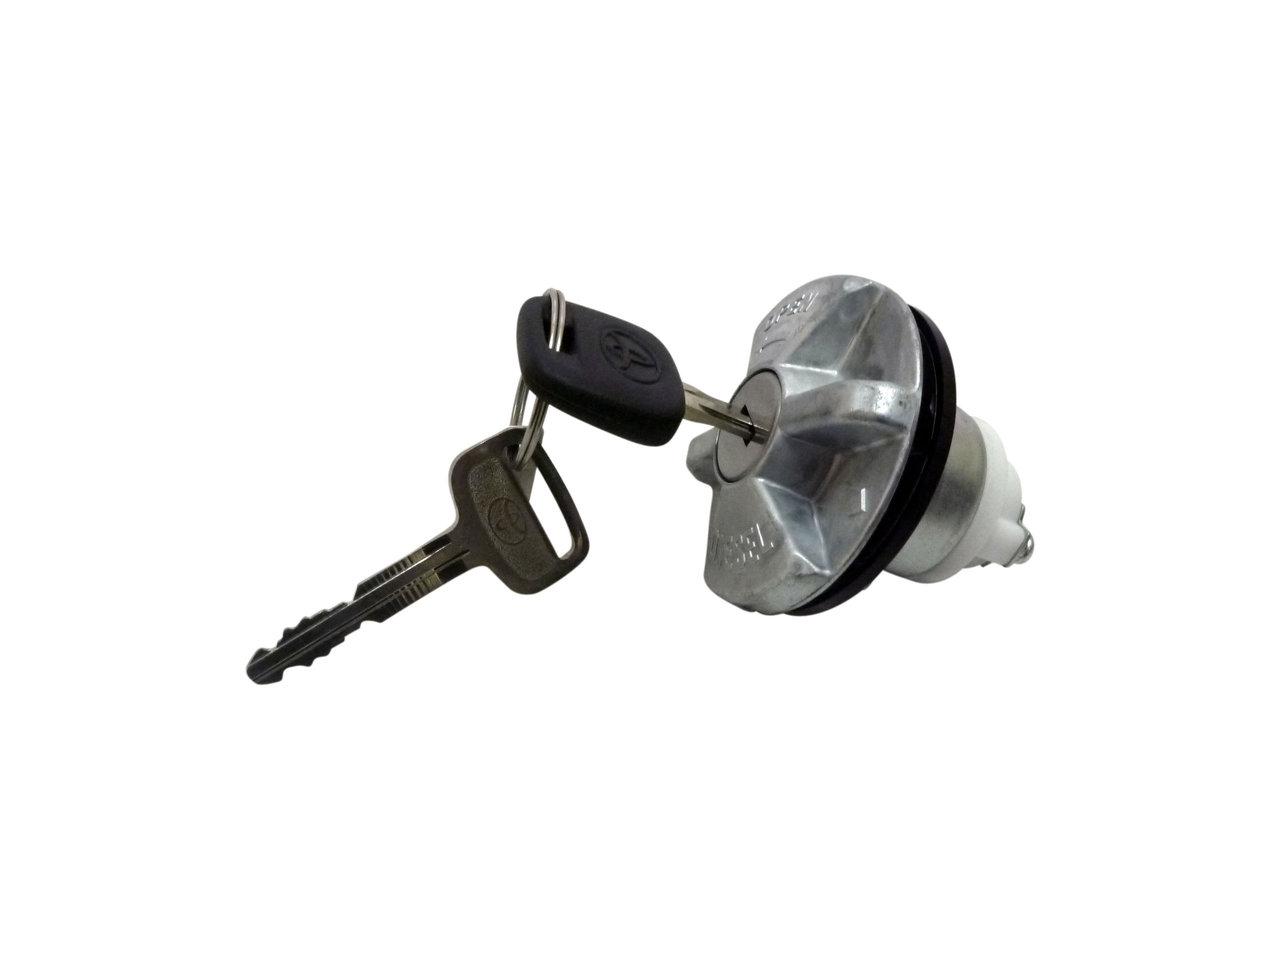 Locking Fuel Cap W Key Suitable For Hilux Kun26 Kun16 Trayback